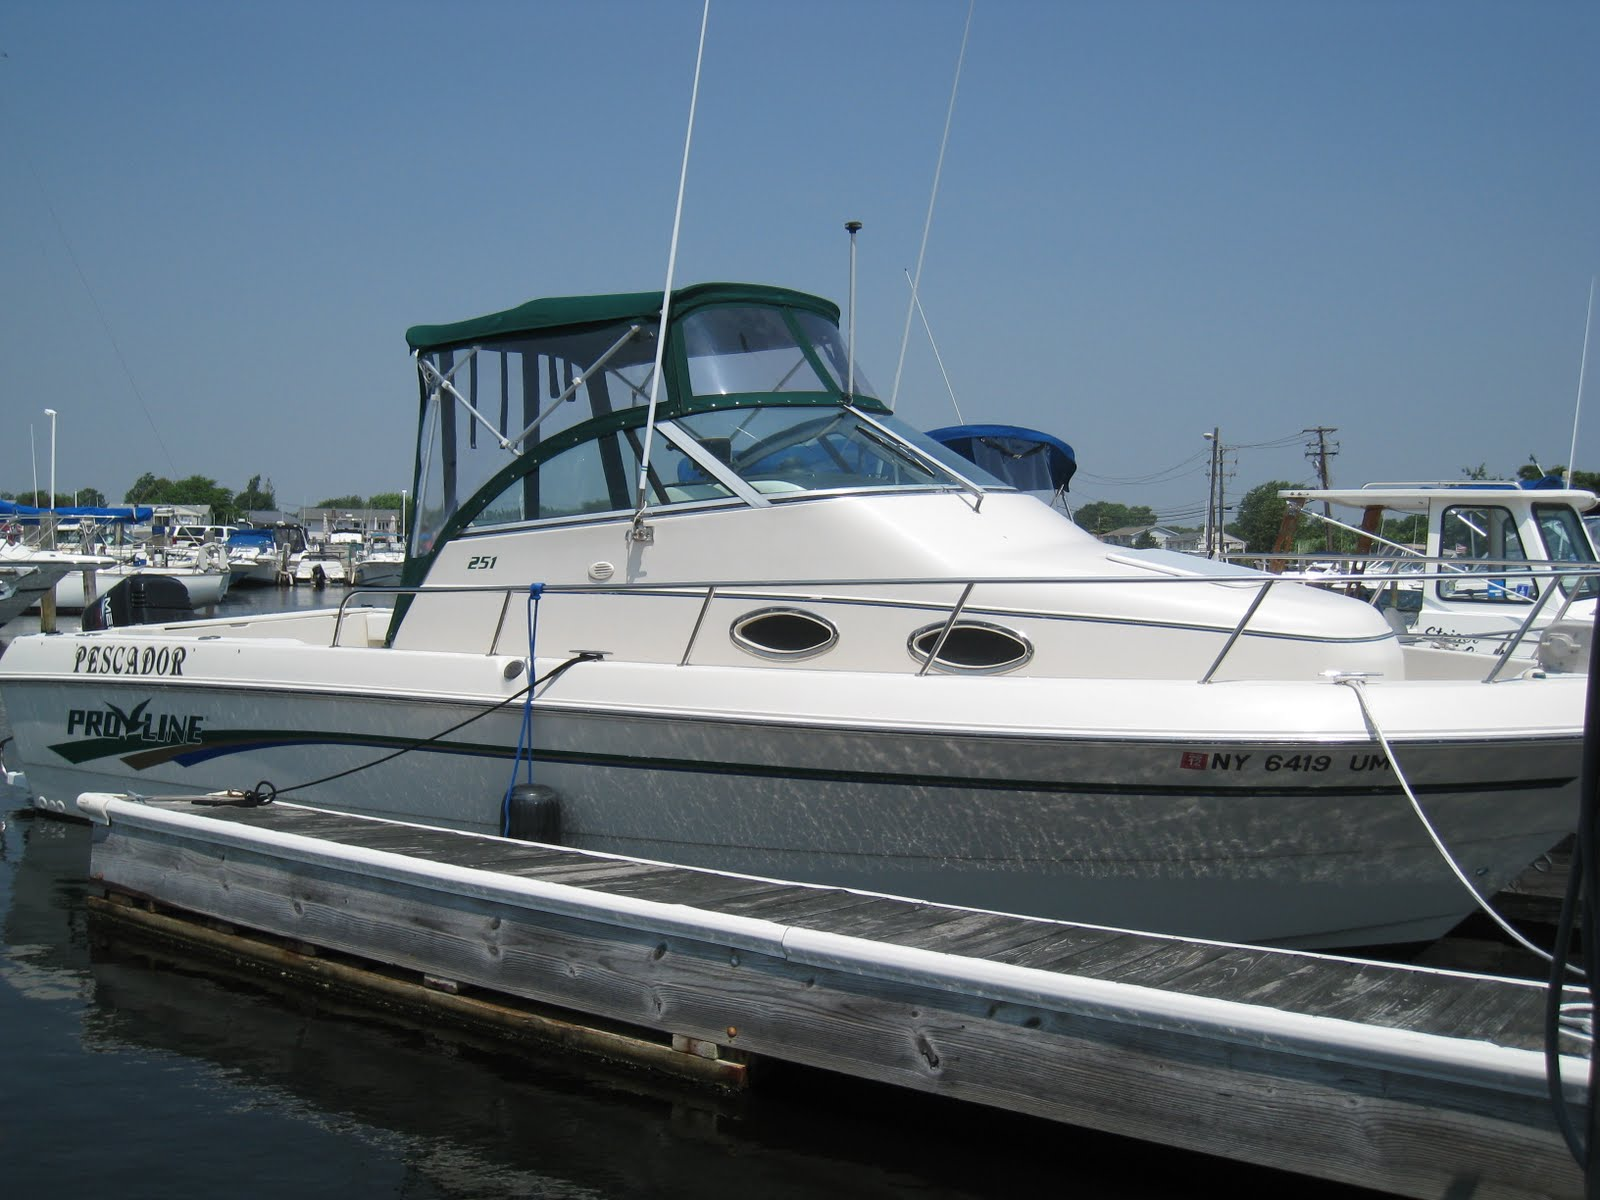 Coast To Coast Sirius Xm >> 1997 Proline 251 Walkaround (27ft) - $15000 (Babyl: 1997 ...